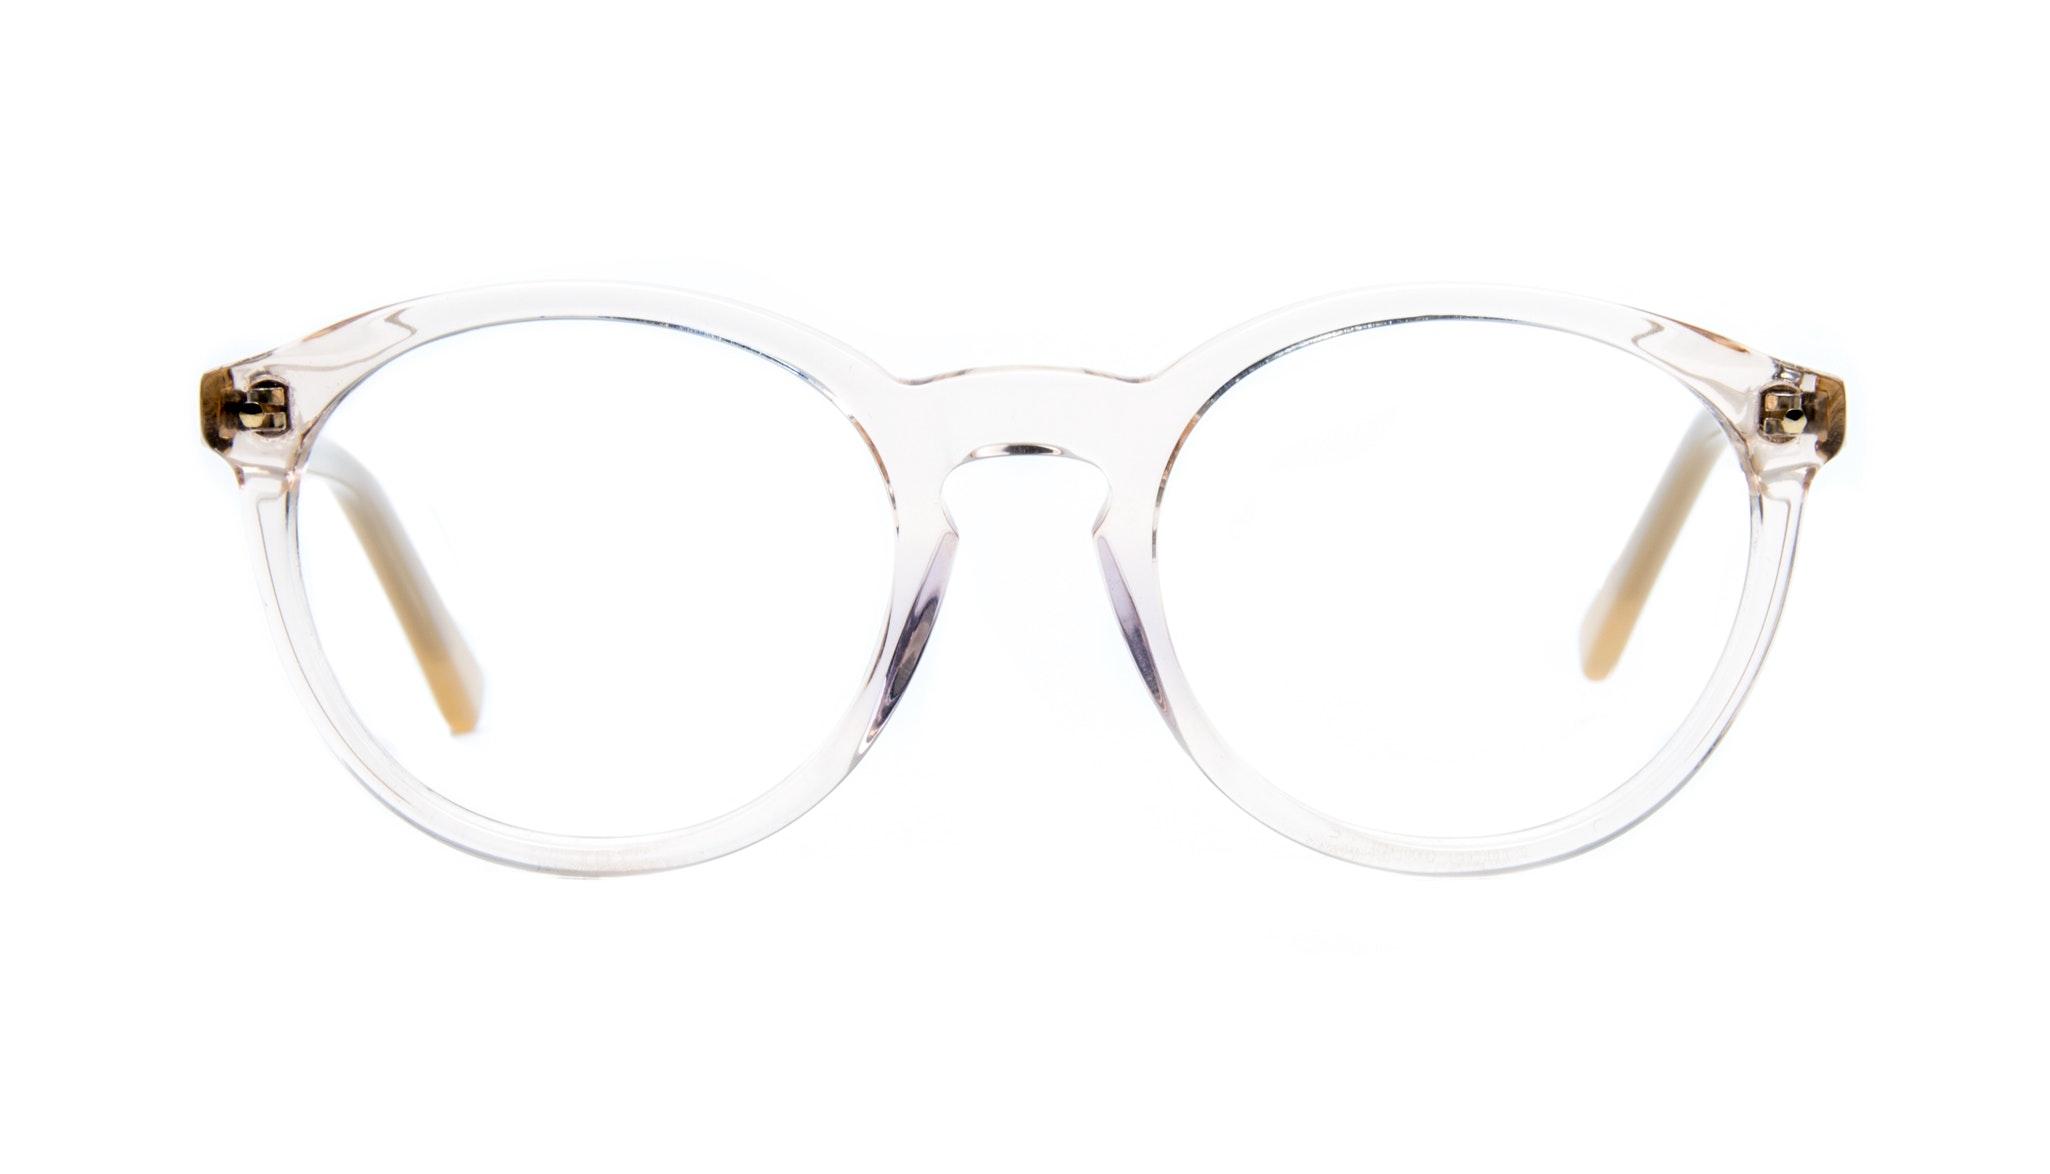 Affordable Fashion Glasses Round Eyeglasses Women Glow Blond Metal